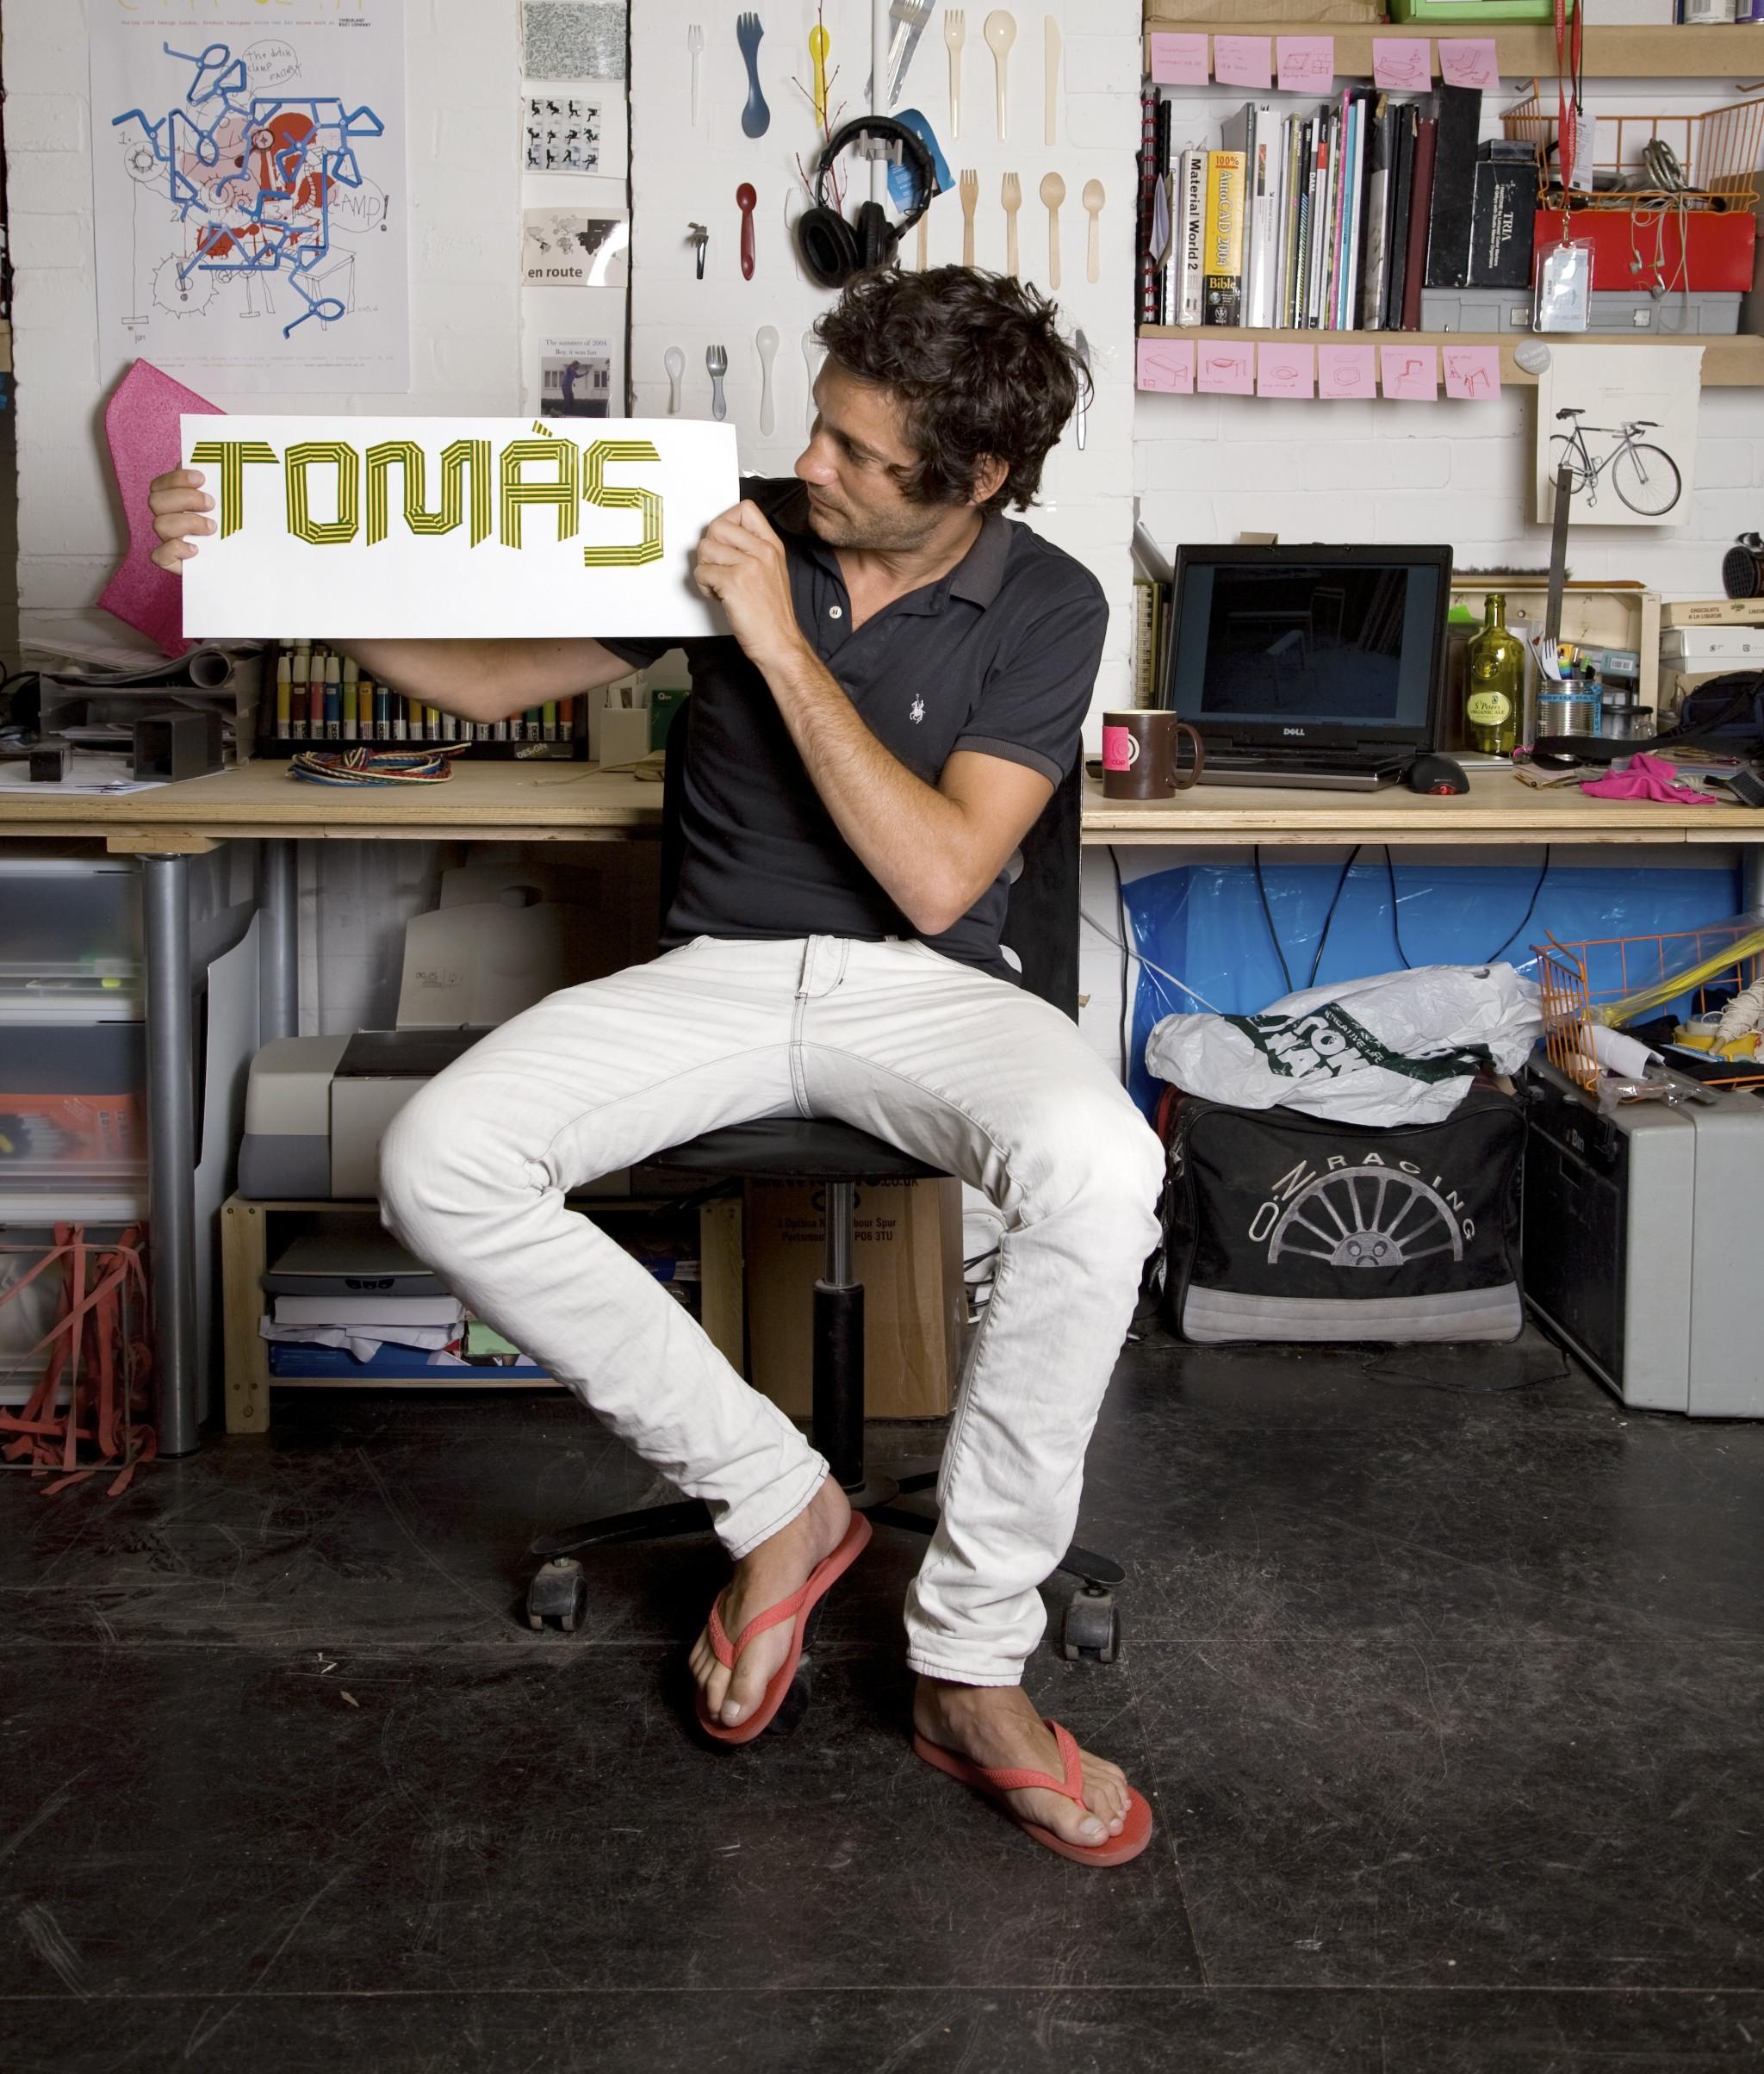 Tomas-1 high.jpg